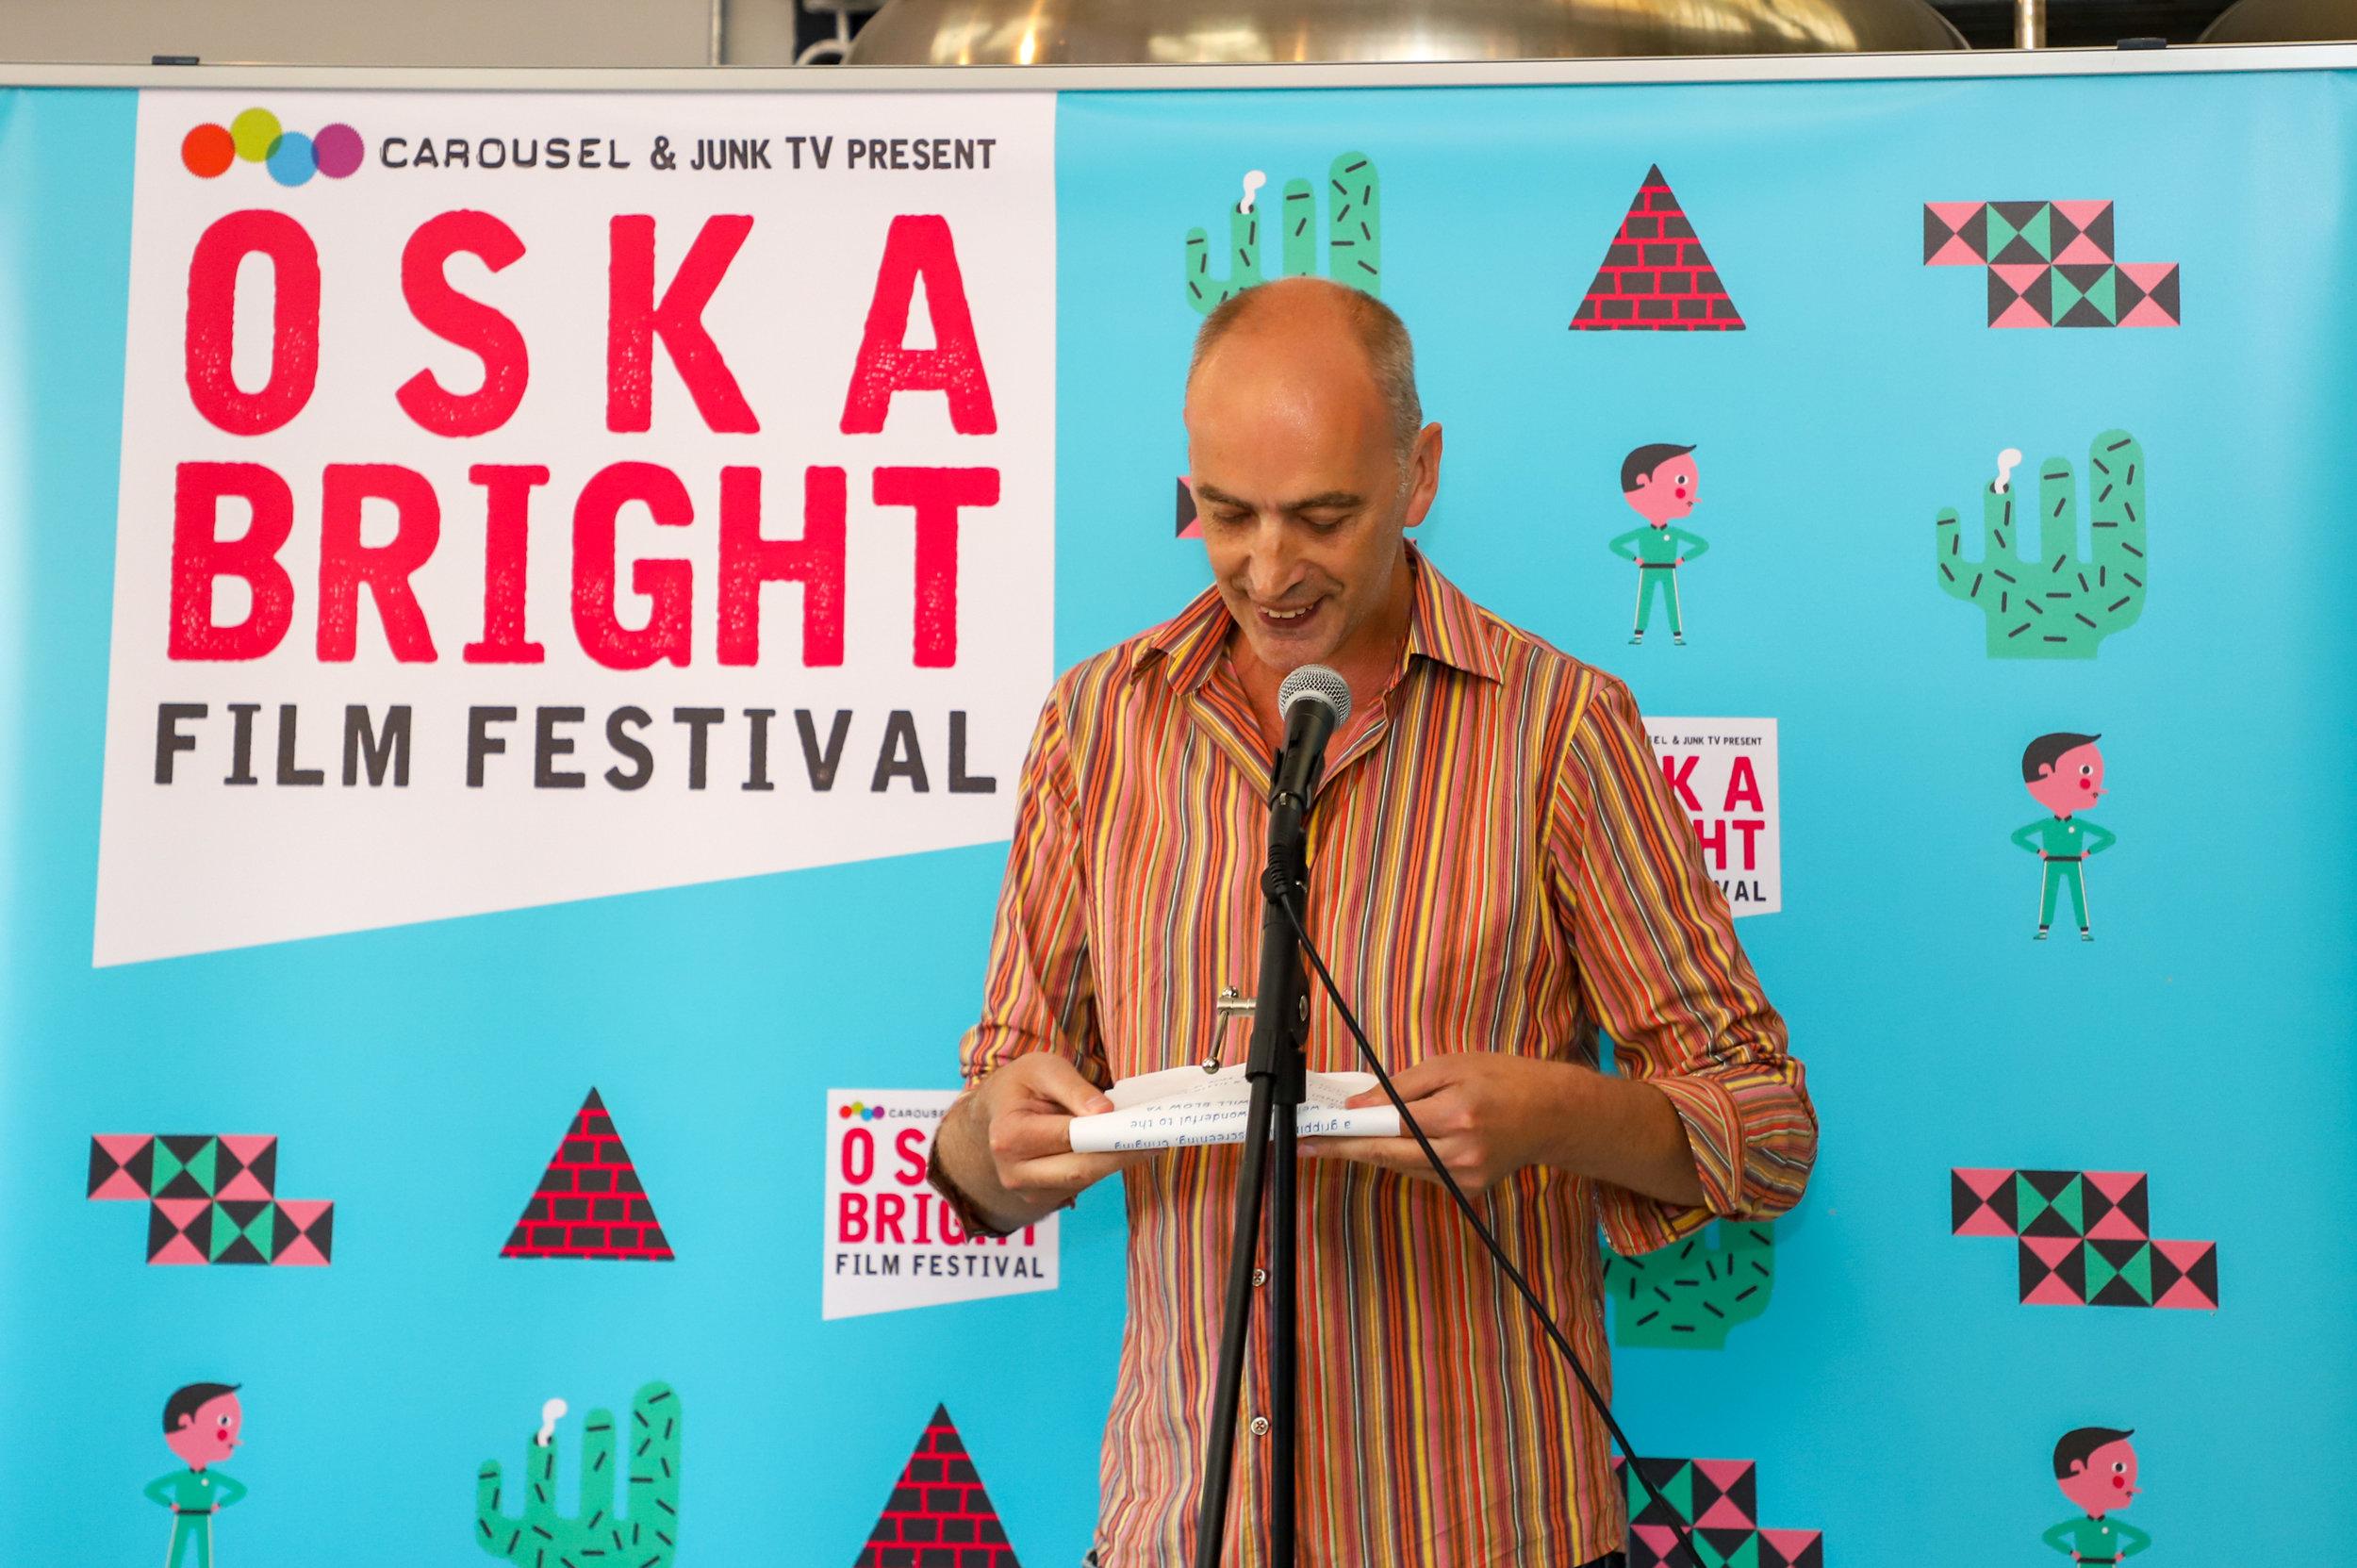 Matthew Hellett speaks at Oska Bright Film Festival Programme Launch